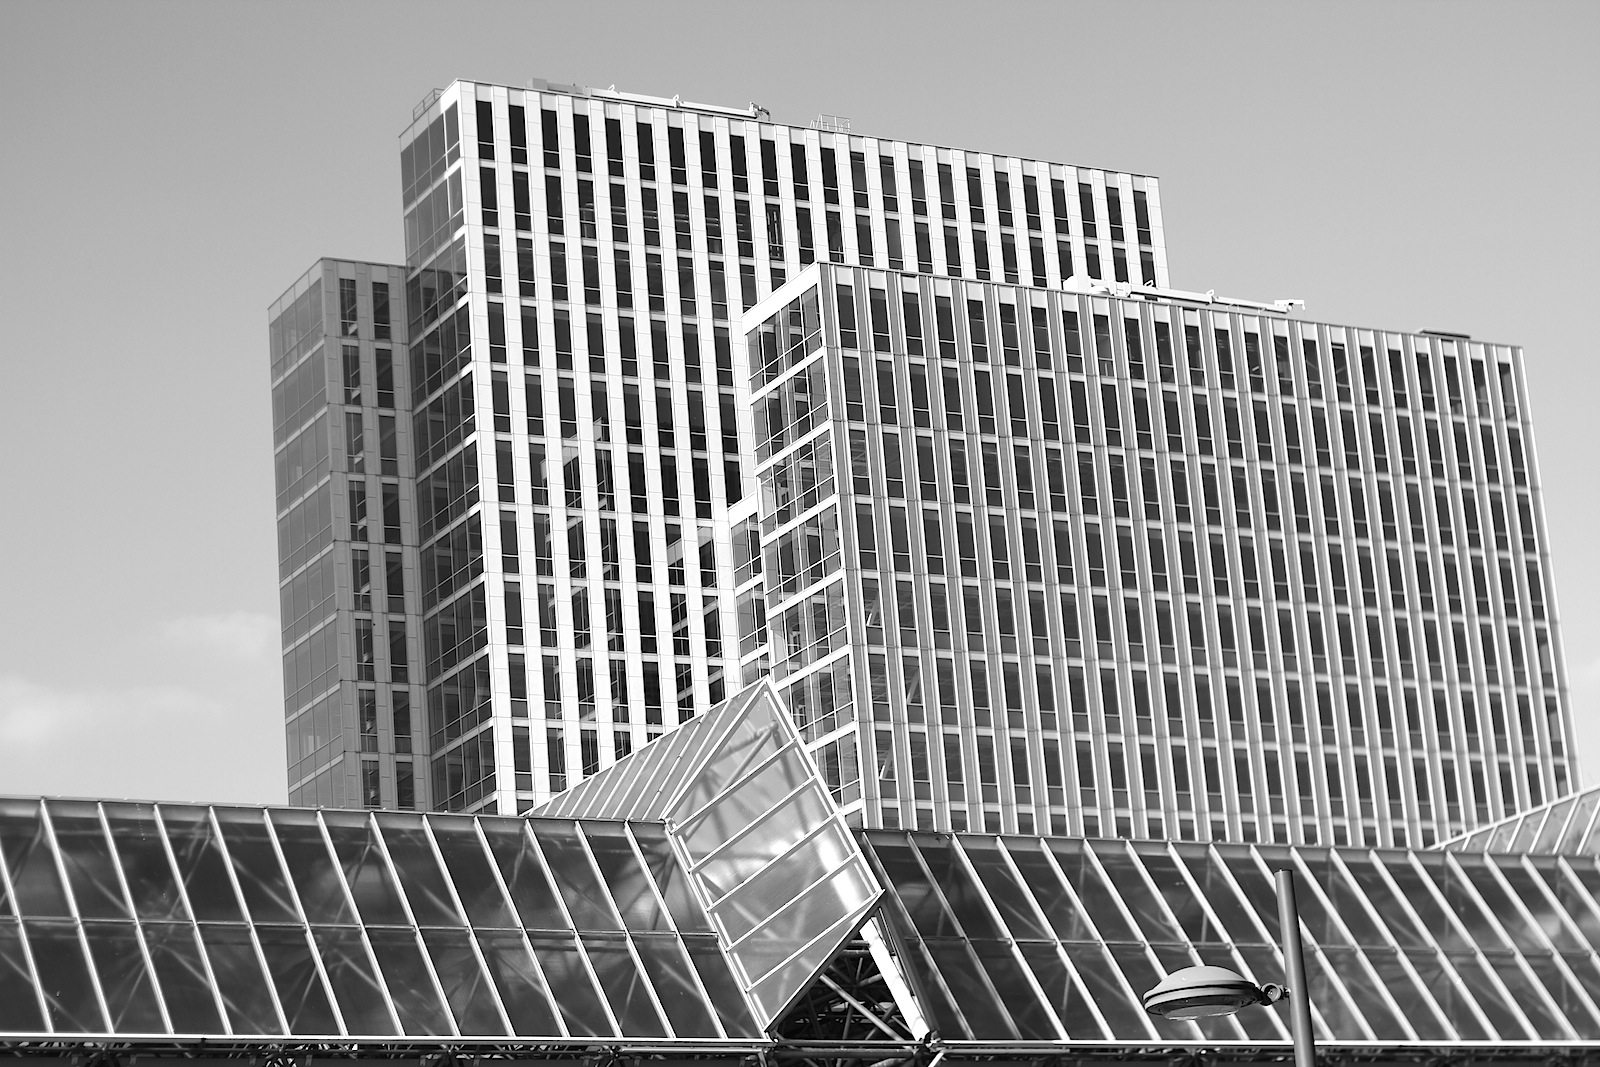 Martinez. ZZDP Architecten, Amsterdam, 2010